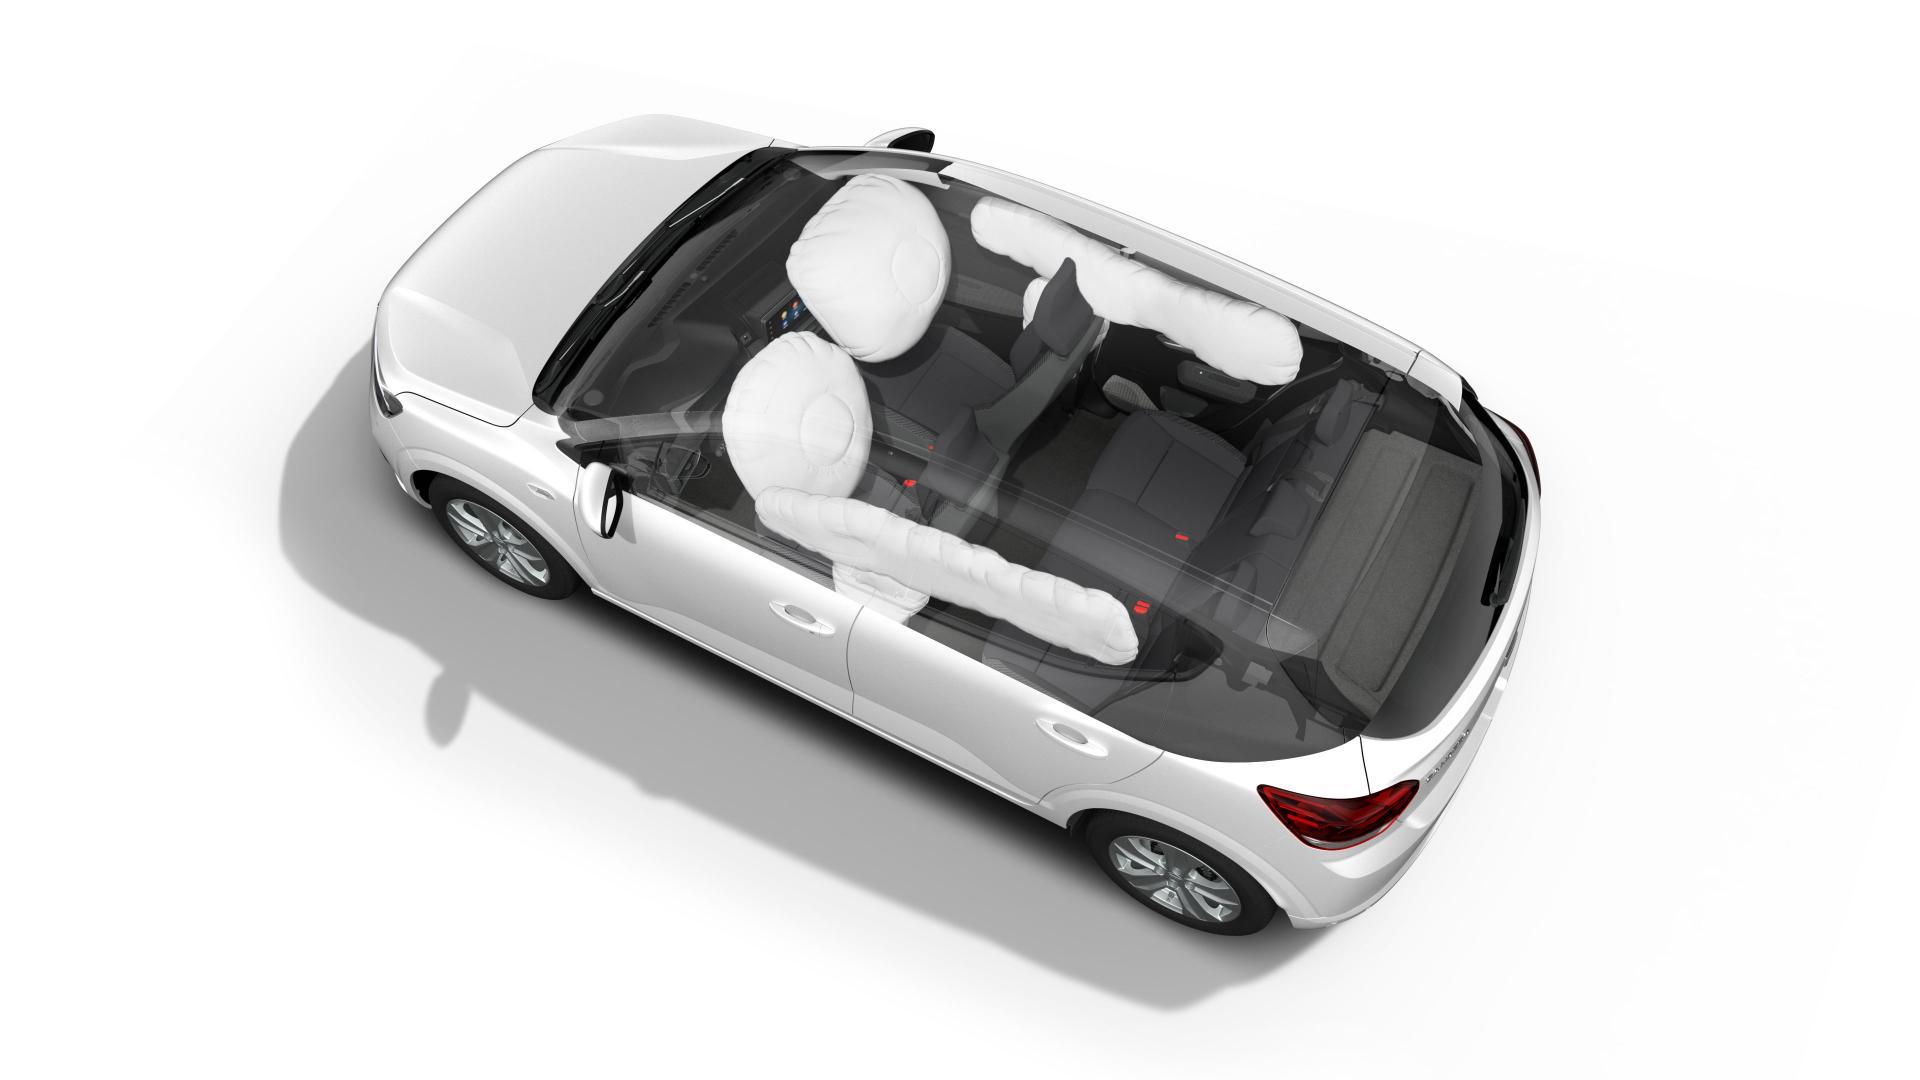 Sechs Airbags im Dacia SANDERO Autohaus Schouren